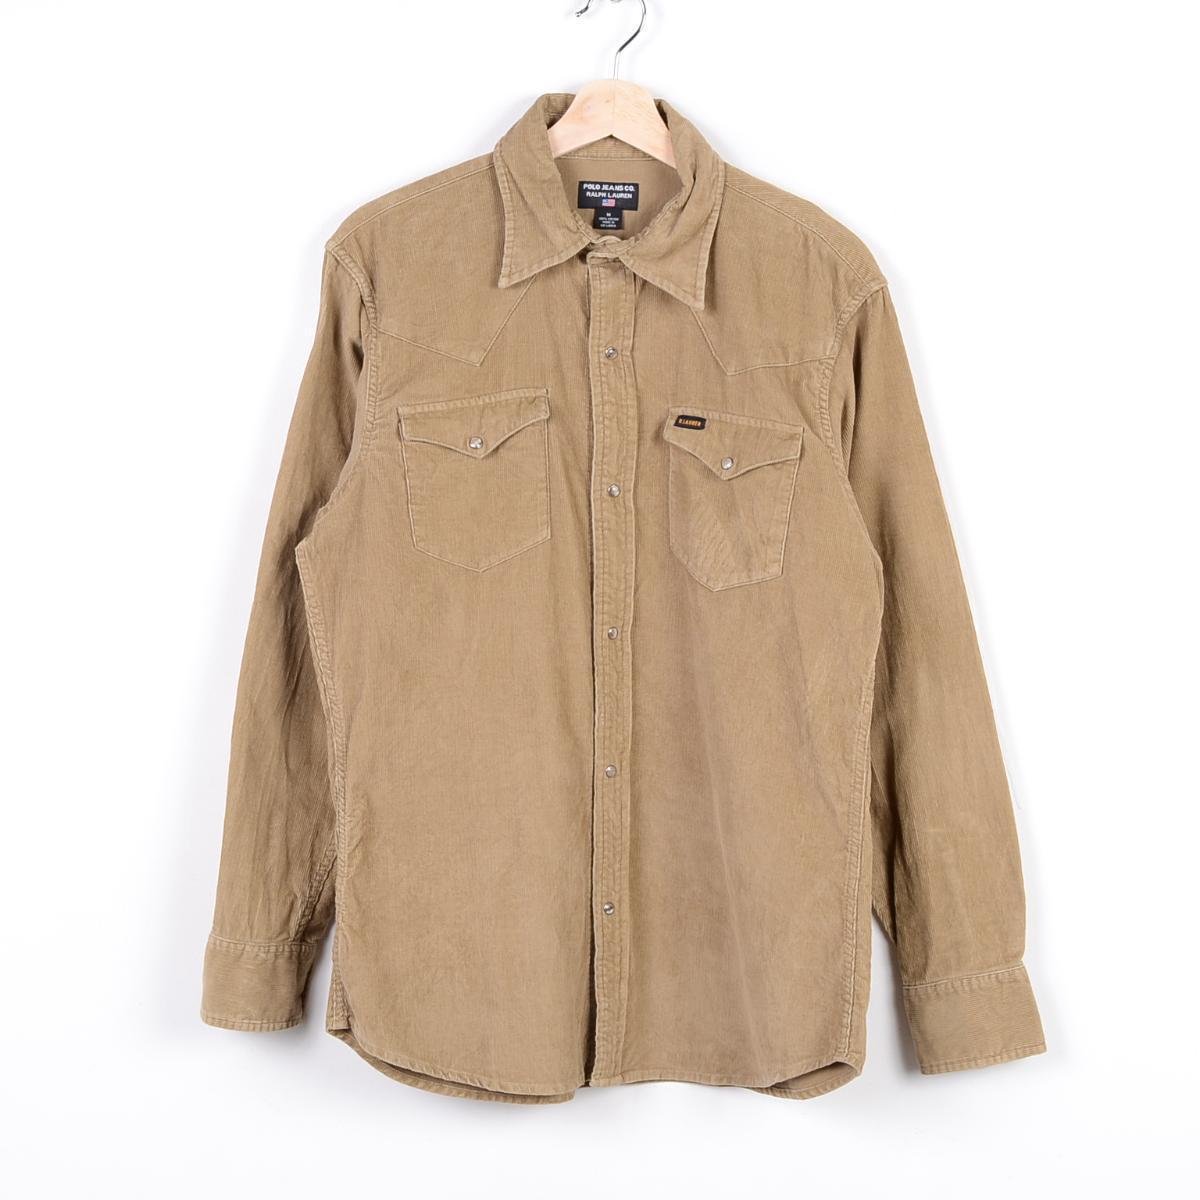 VINTAGE CLOTHING JAM TRADING | Rakuten Global Market: Ralph Lauren POLO JEANS COMPANY long sleeve corduroy Western shirt mens L Ralph Lauren /wep1611 160409